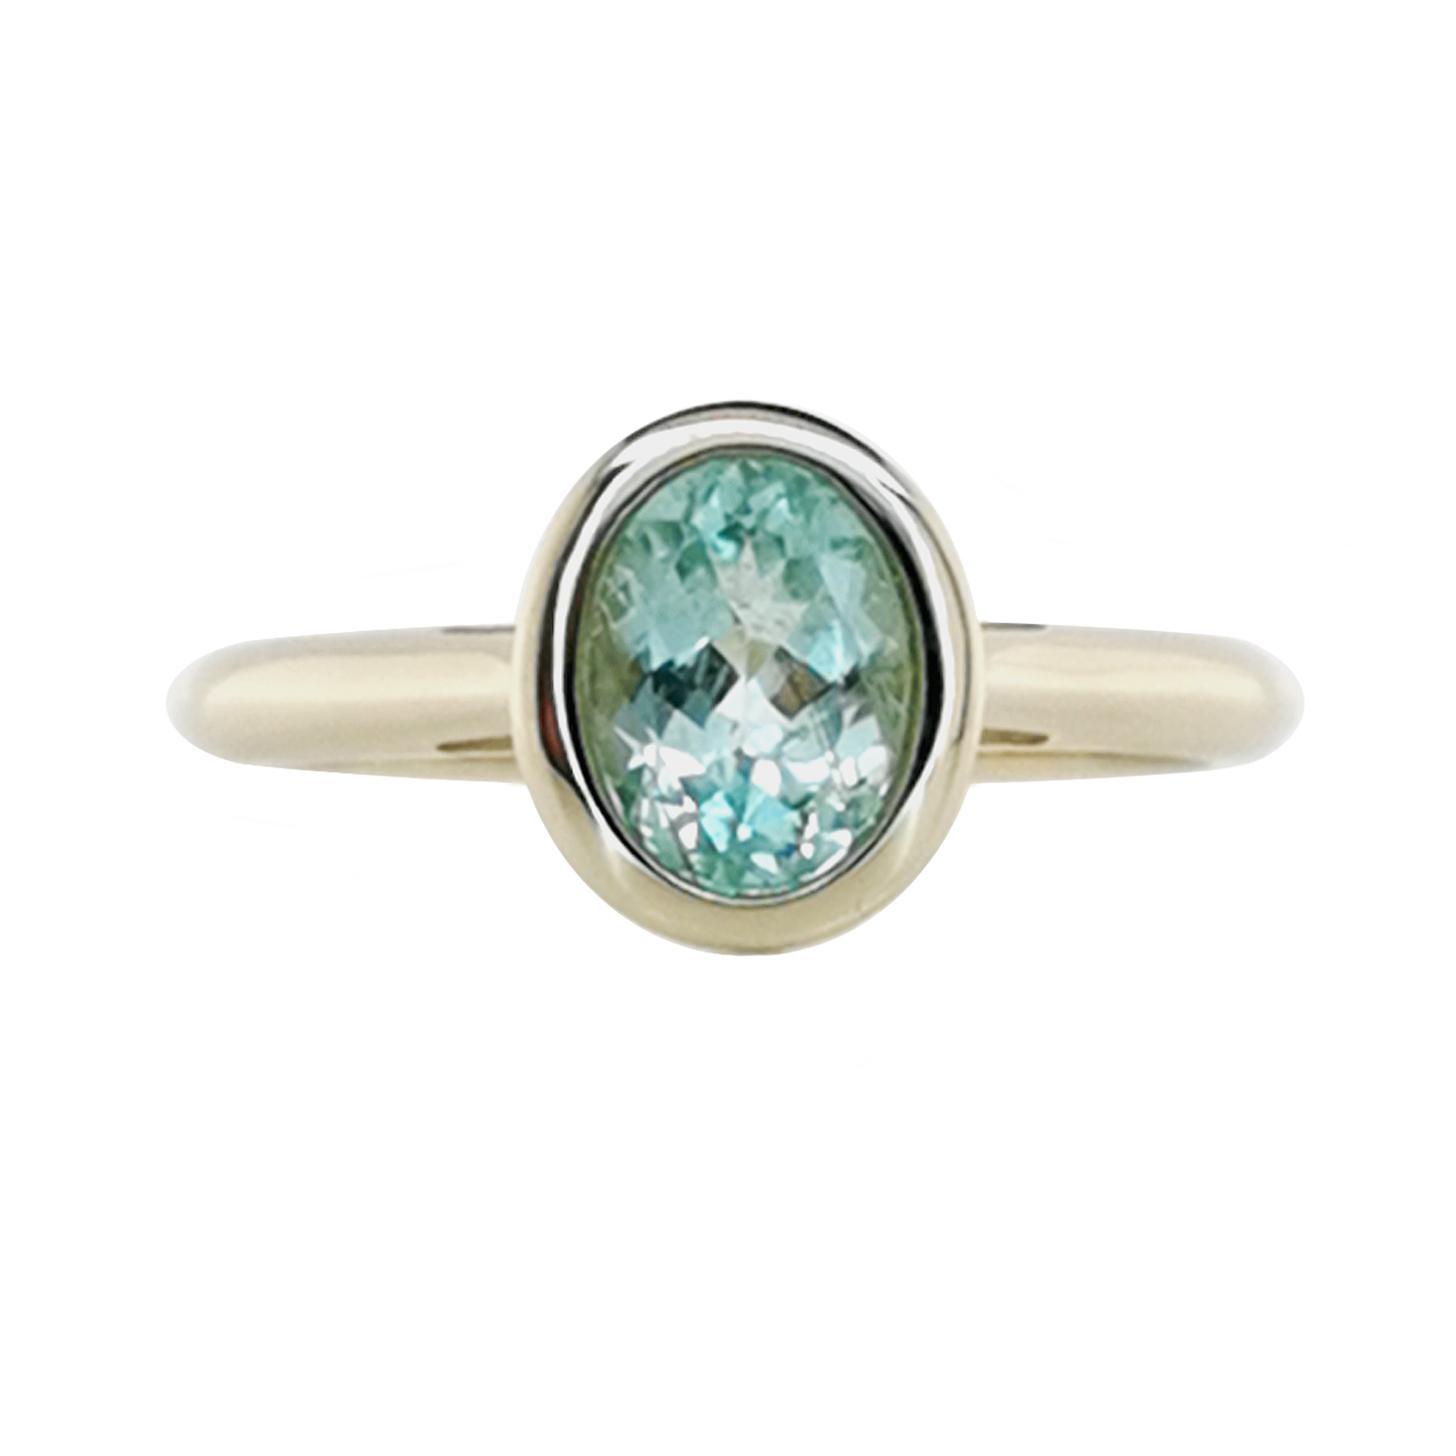 Ring mit Paraiba Turmalin, ca. 1,24ct, GG 585